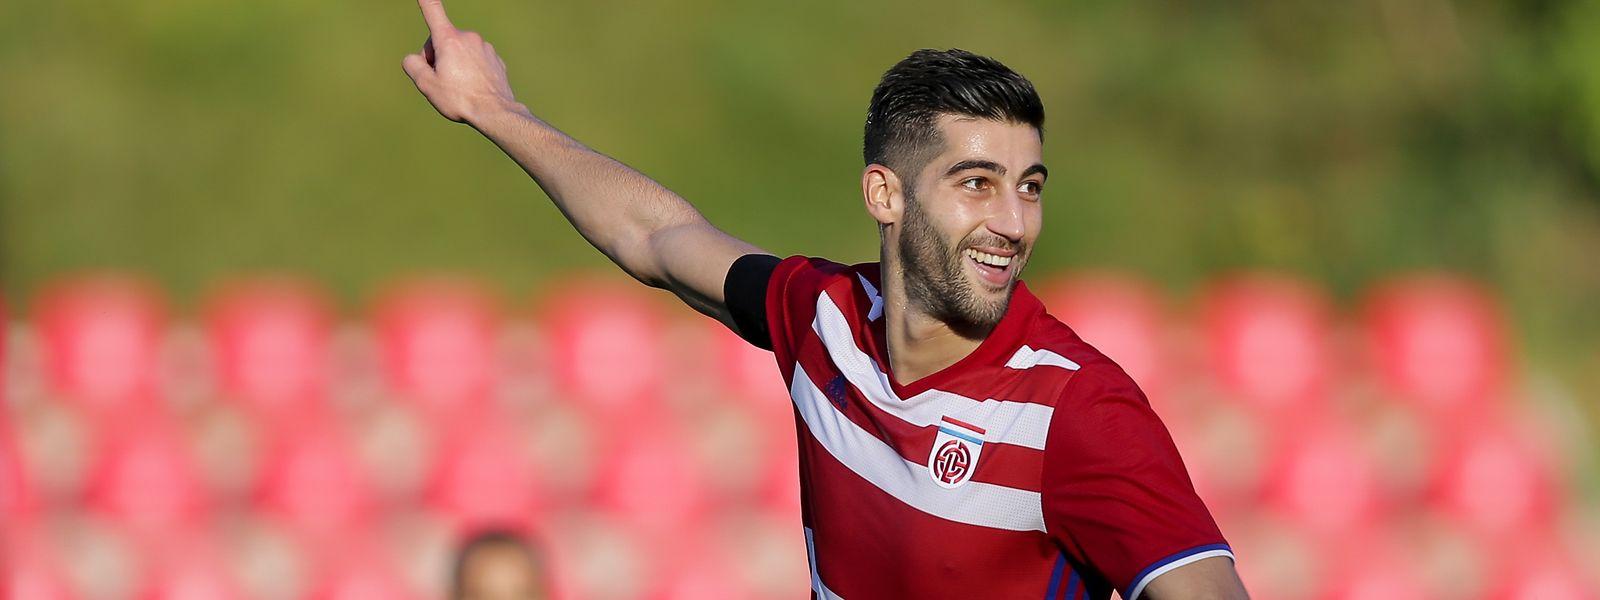 Samir Hadji voltou a fazer o gosto ao pé frente ao Differdange